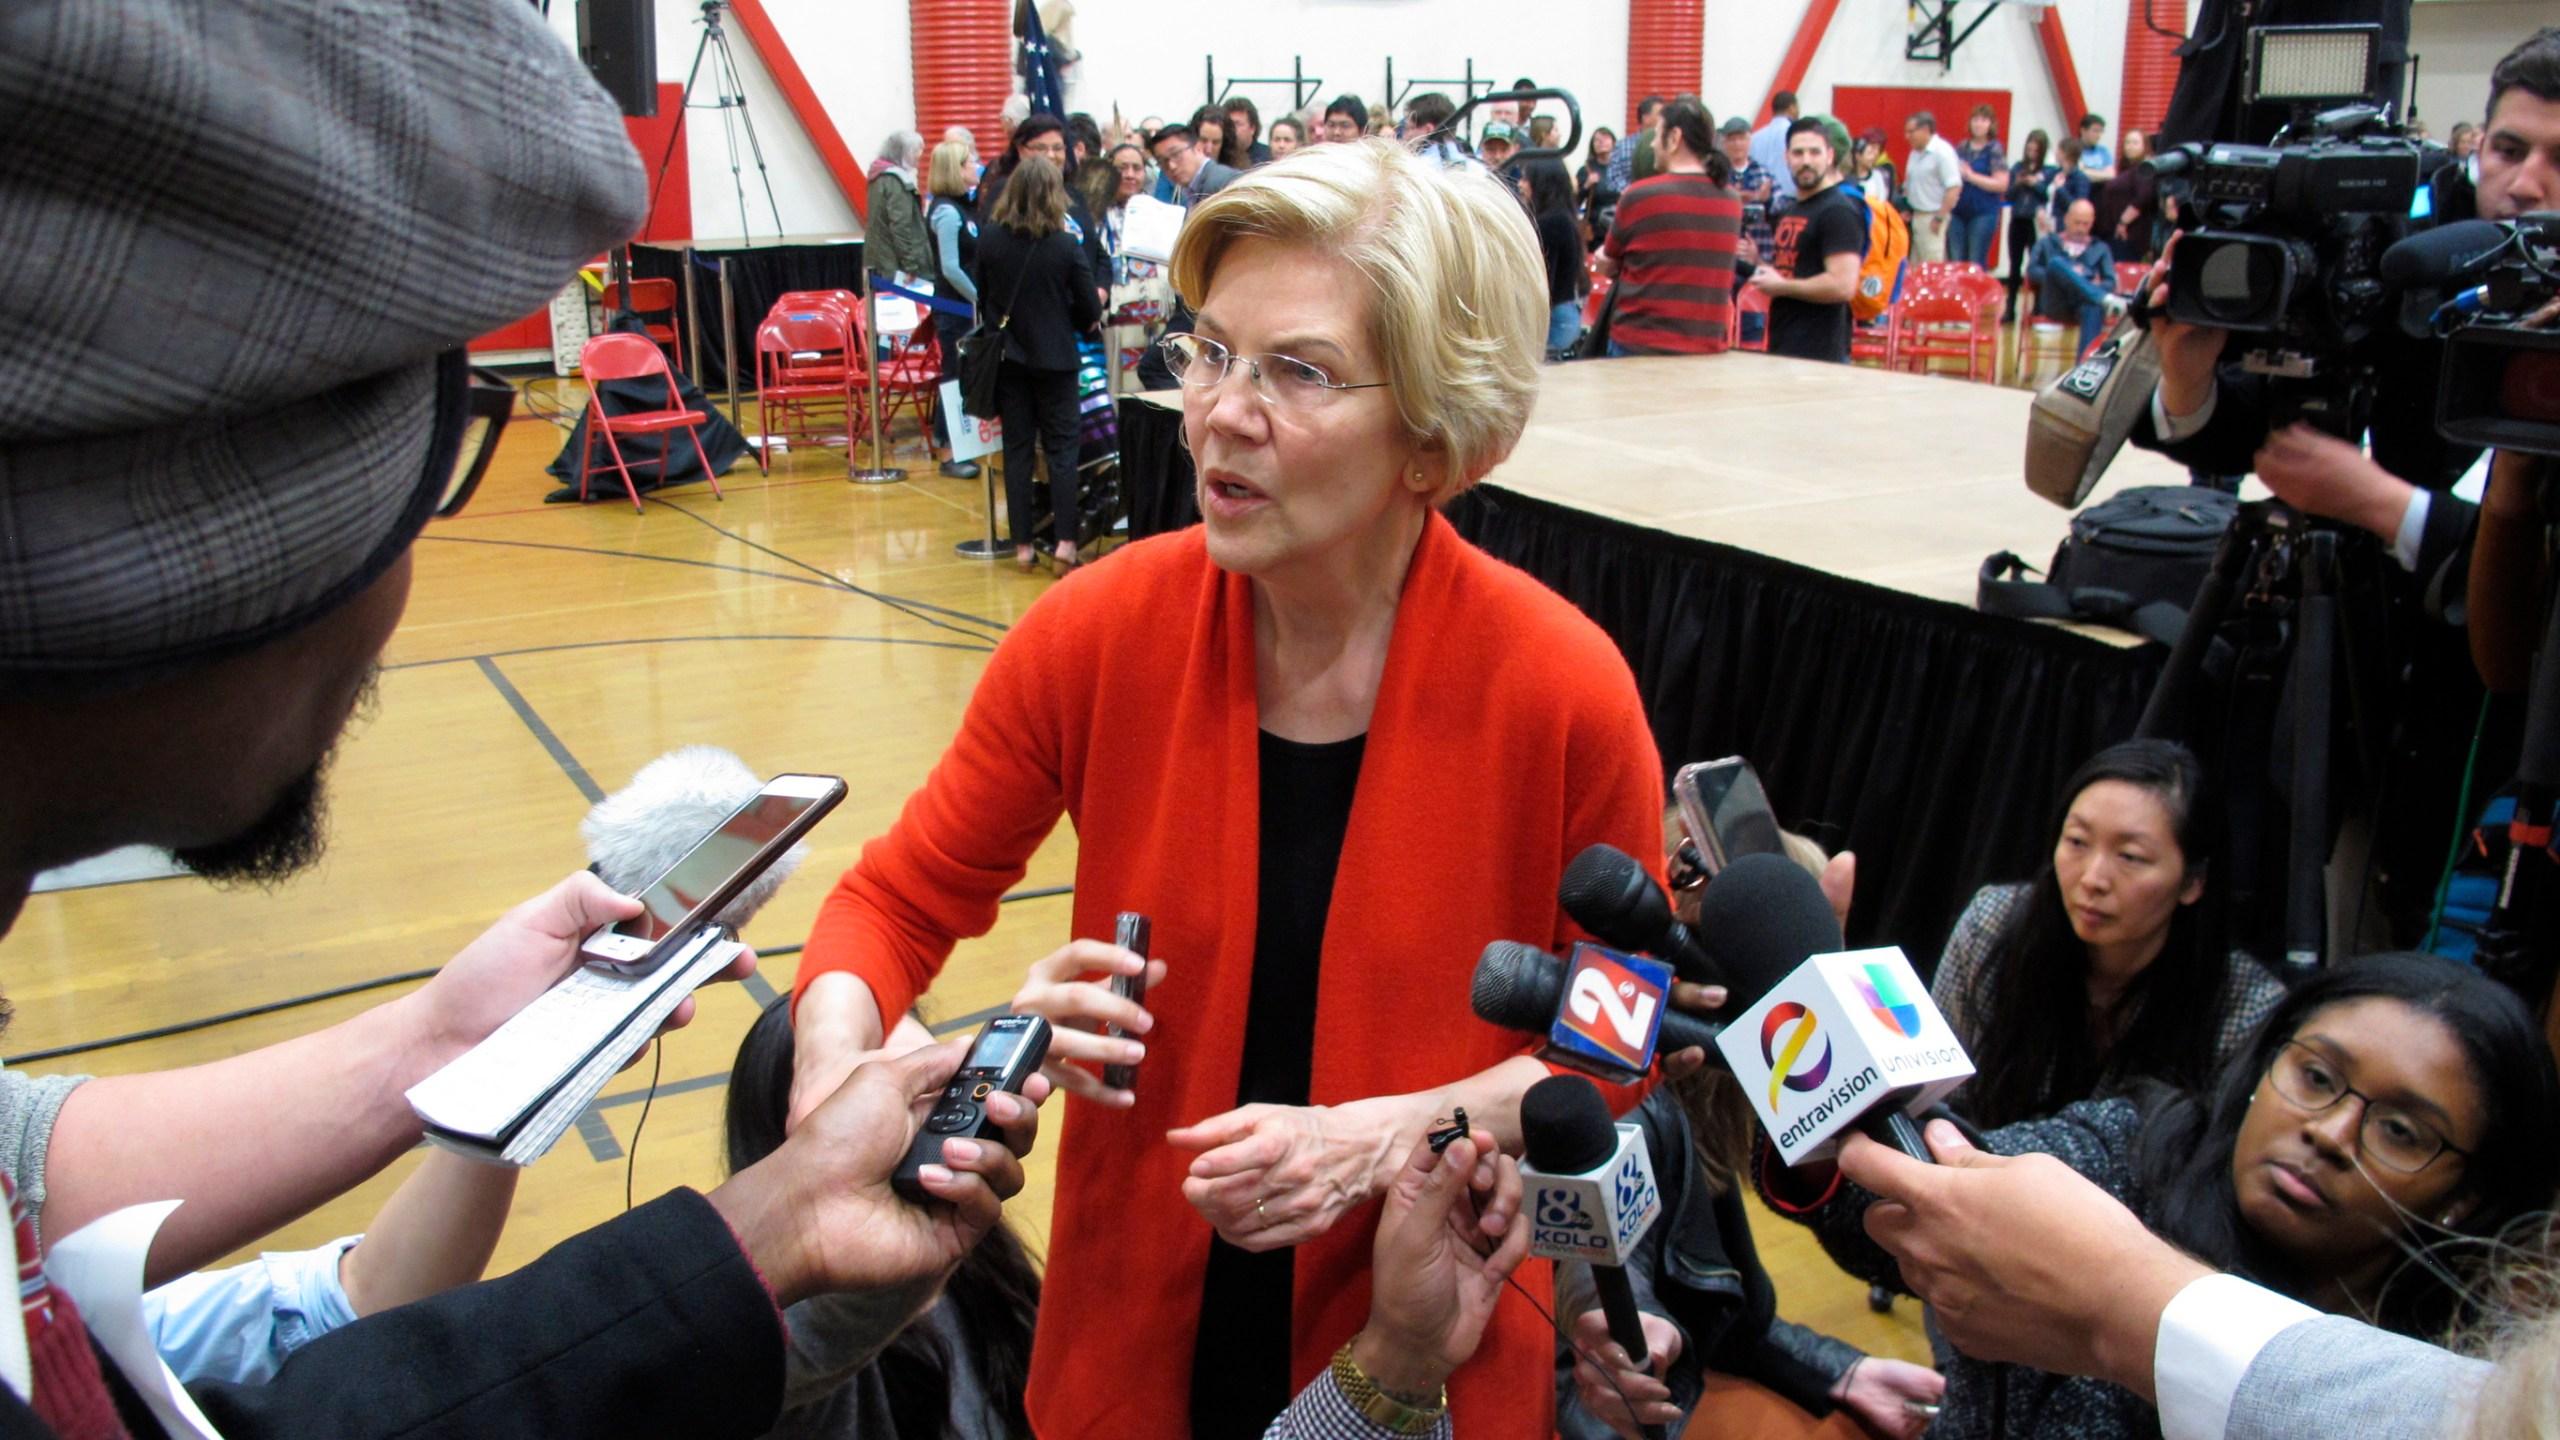 Election_2020_Elizabeth_Warren_Nevada_63368-159532.jpg42457914